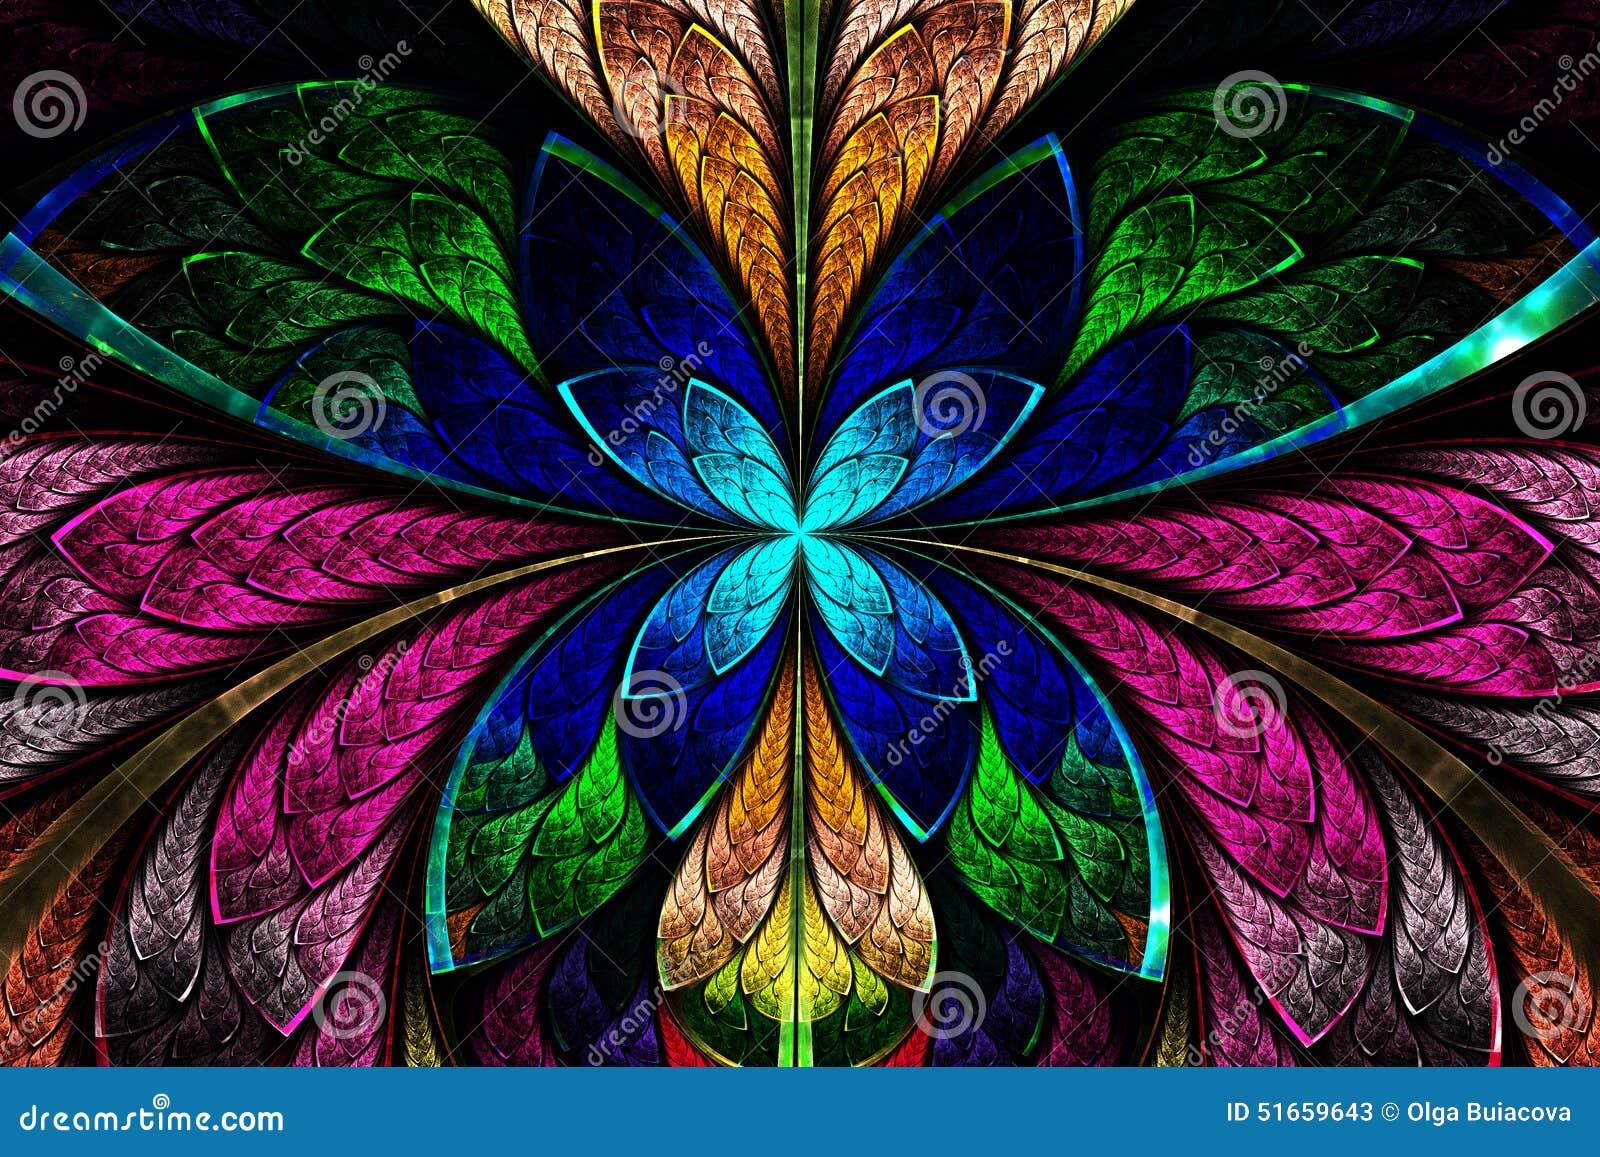 Multicolored symmetrisch fractal patroon als bloem of vlinder